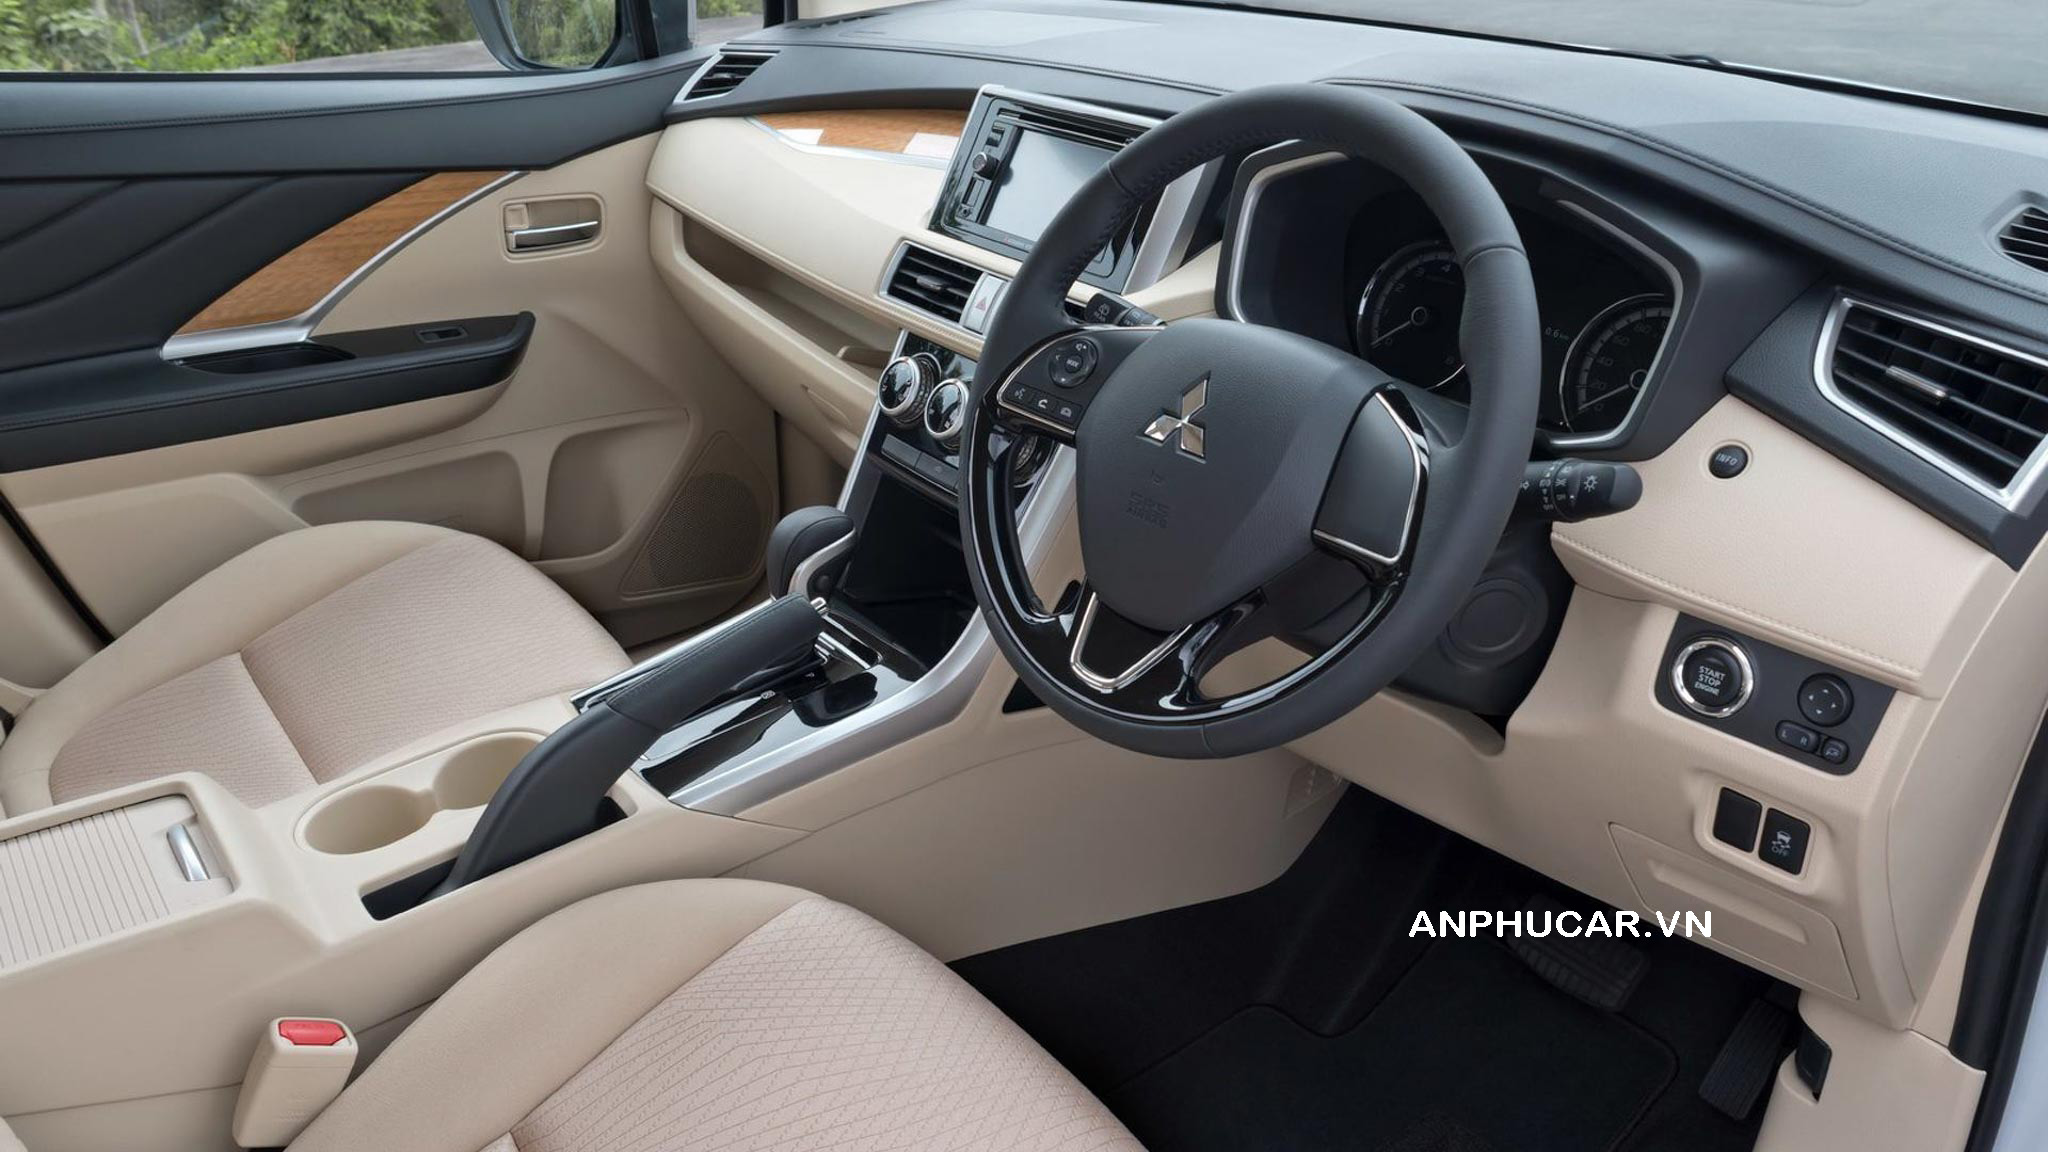 Nội thất khoang lái Mitsubishi Xpander 2020